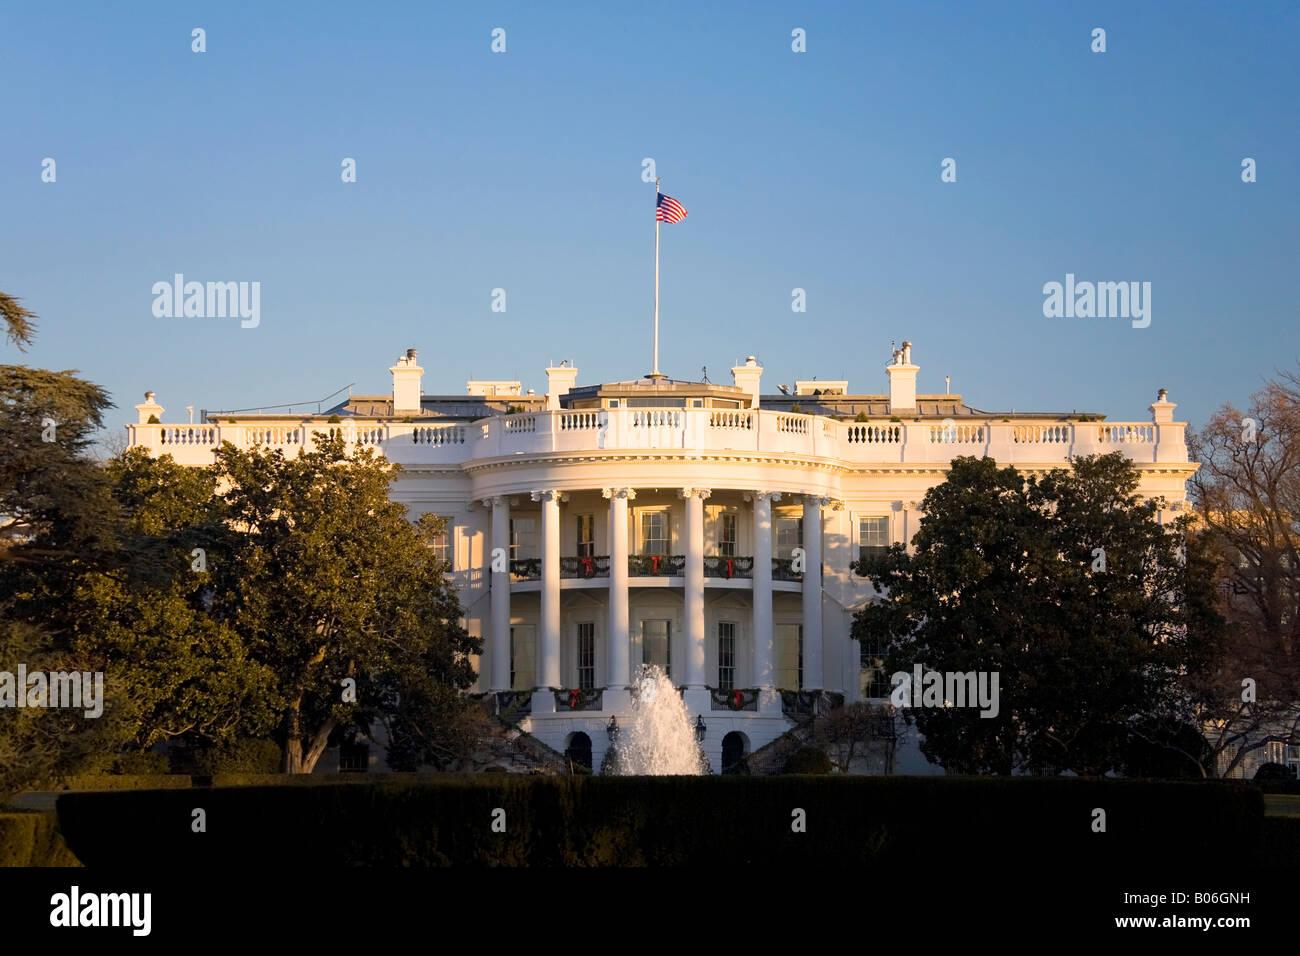 The White House, Washington DC, USA - Stock Image